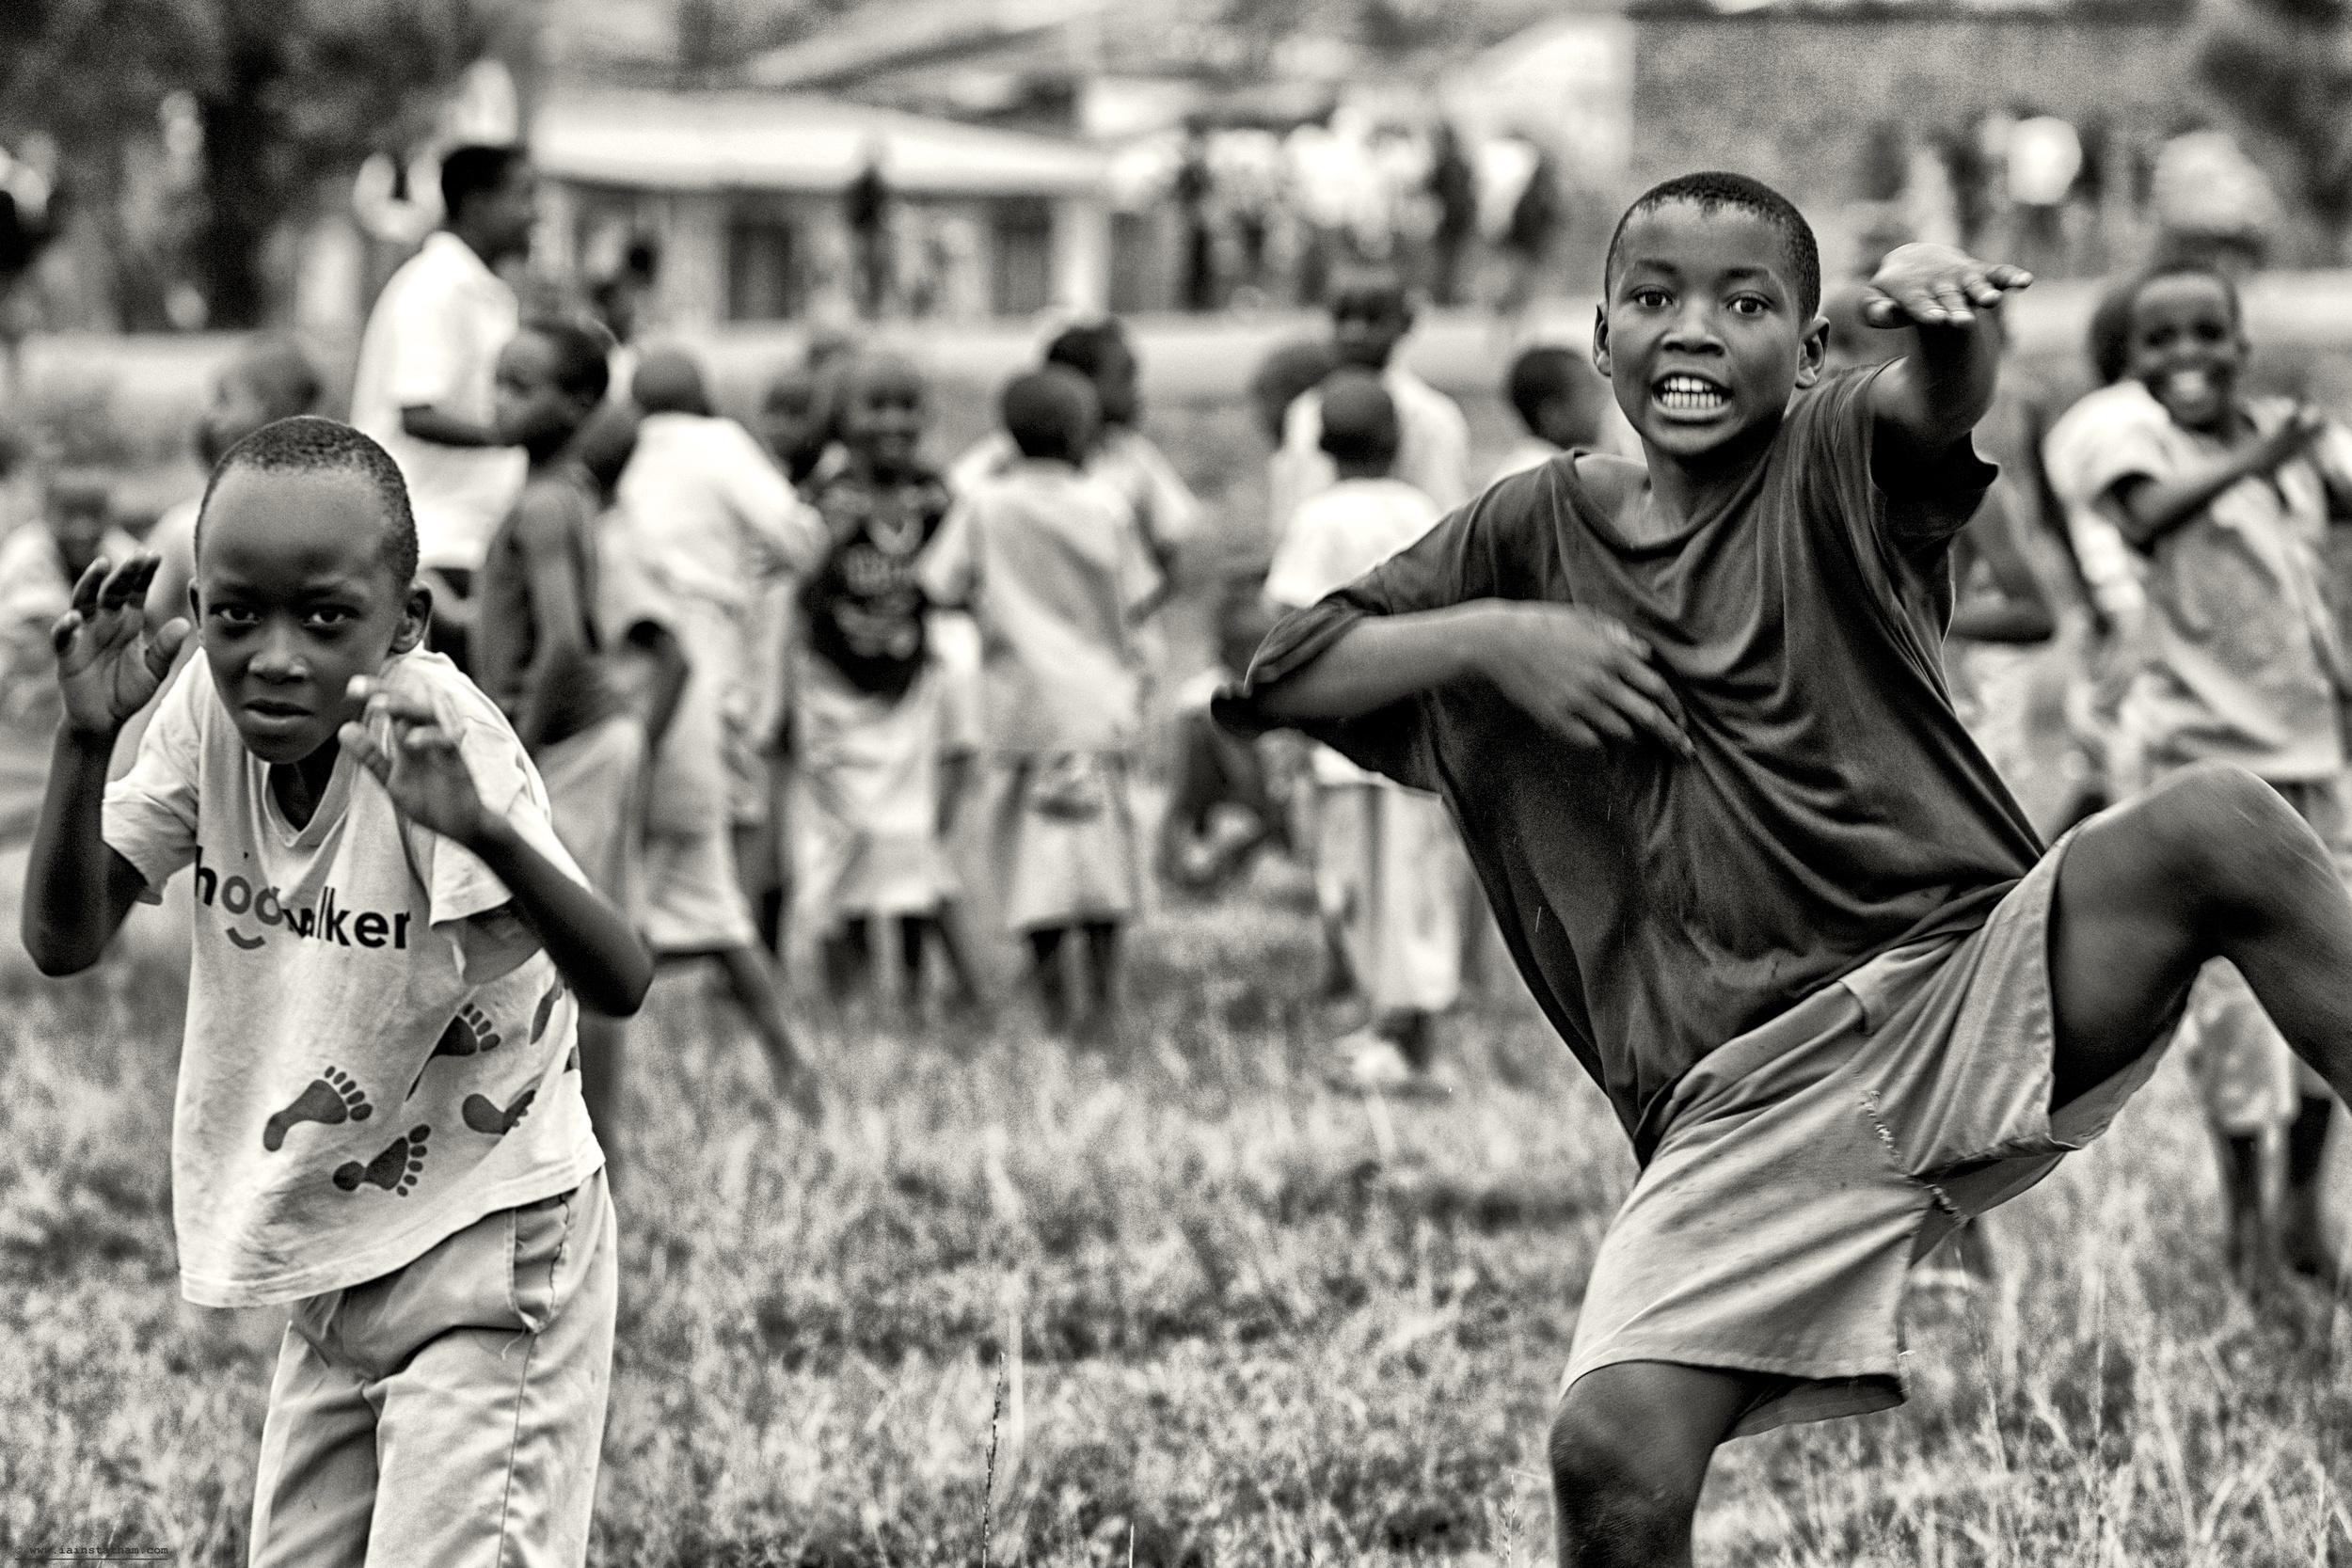 burundi bw feb 14 8.jpg